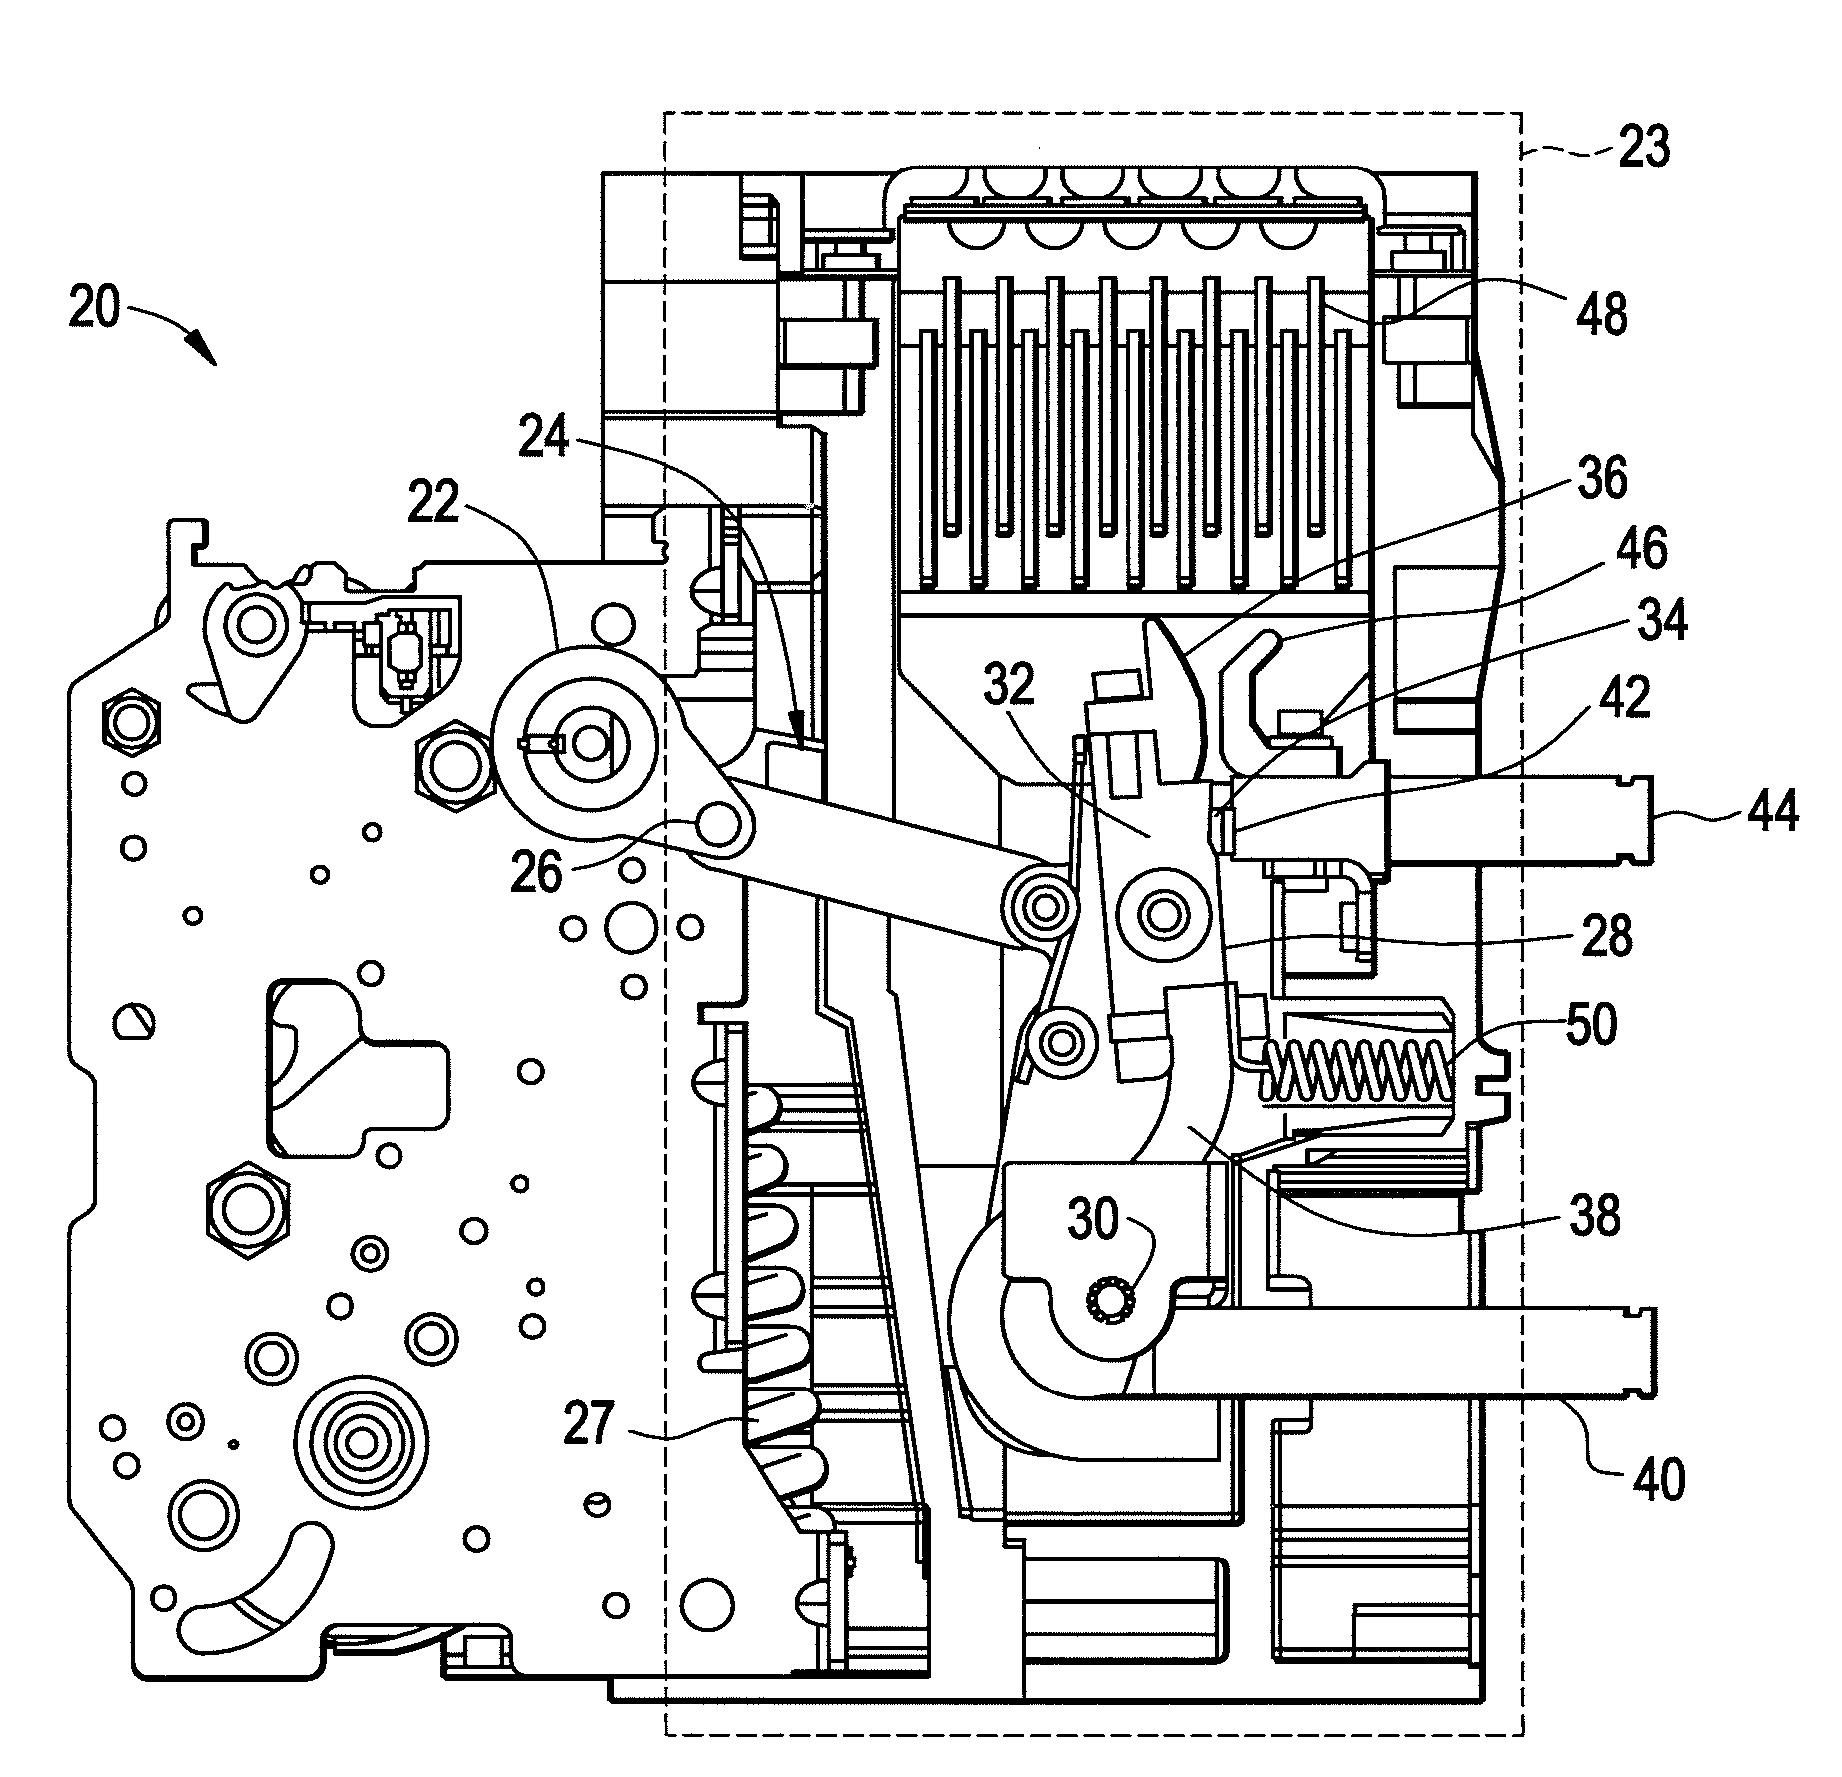 patente us7863534